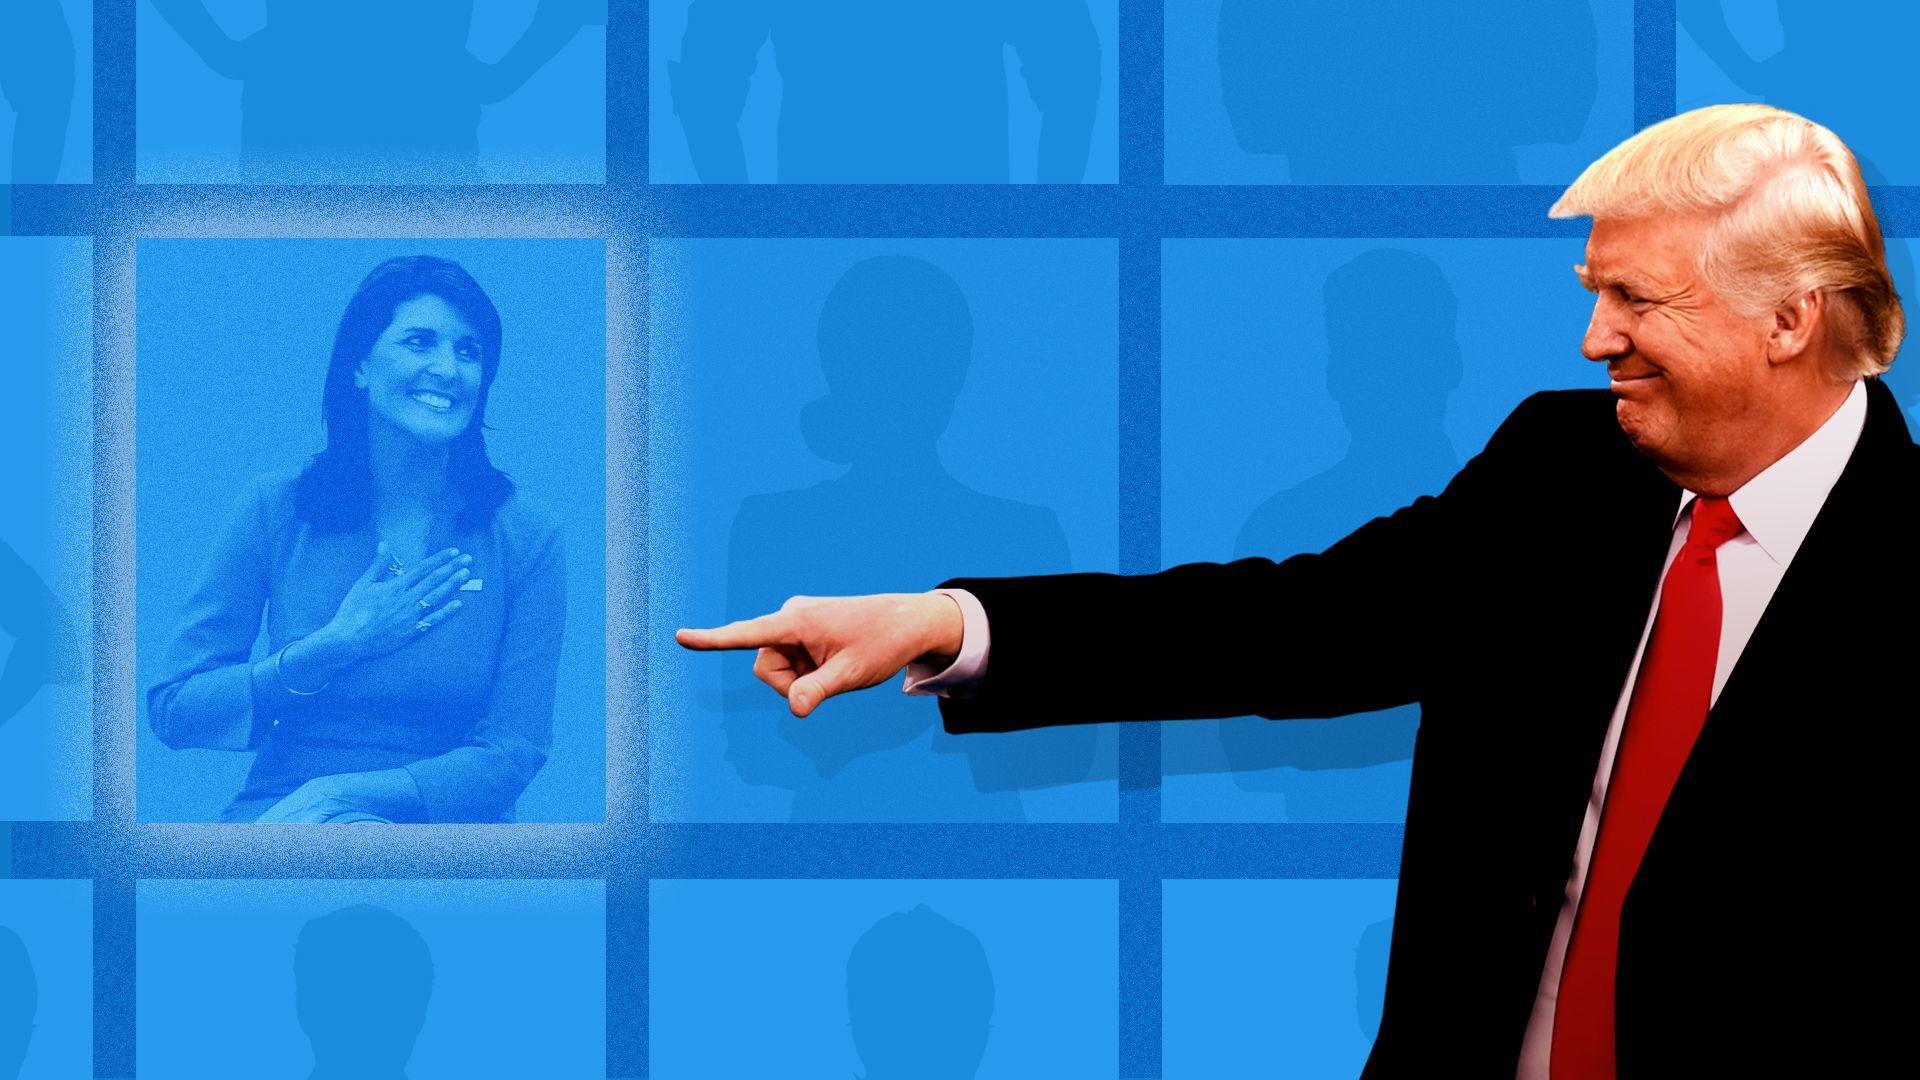 Illustration: Trump pointing at flattered Nicki Haley.